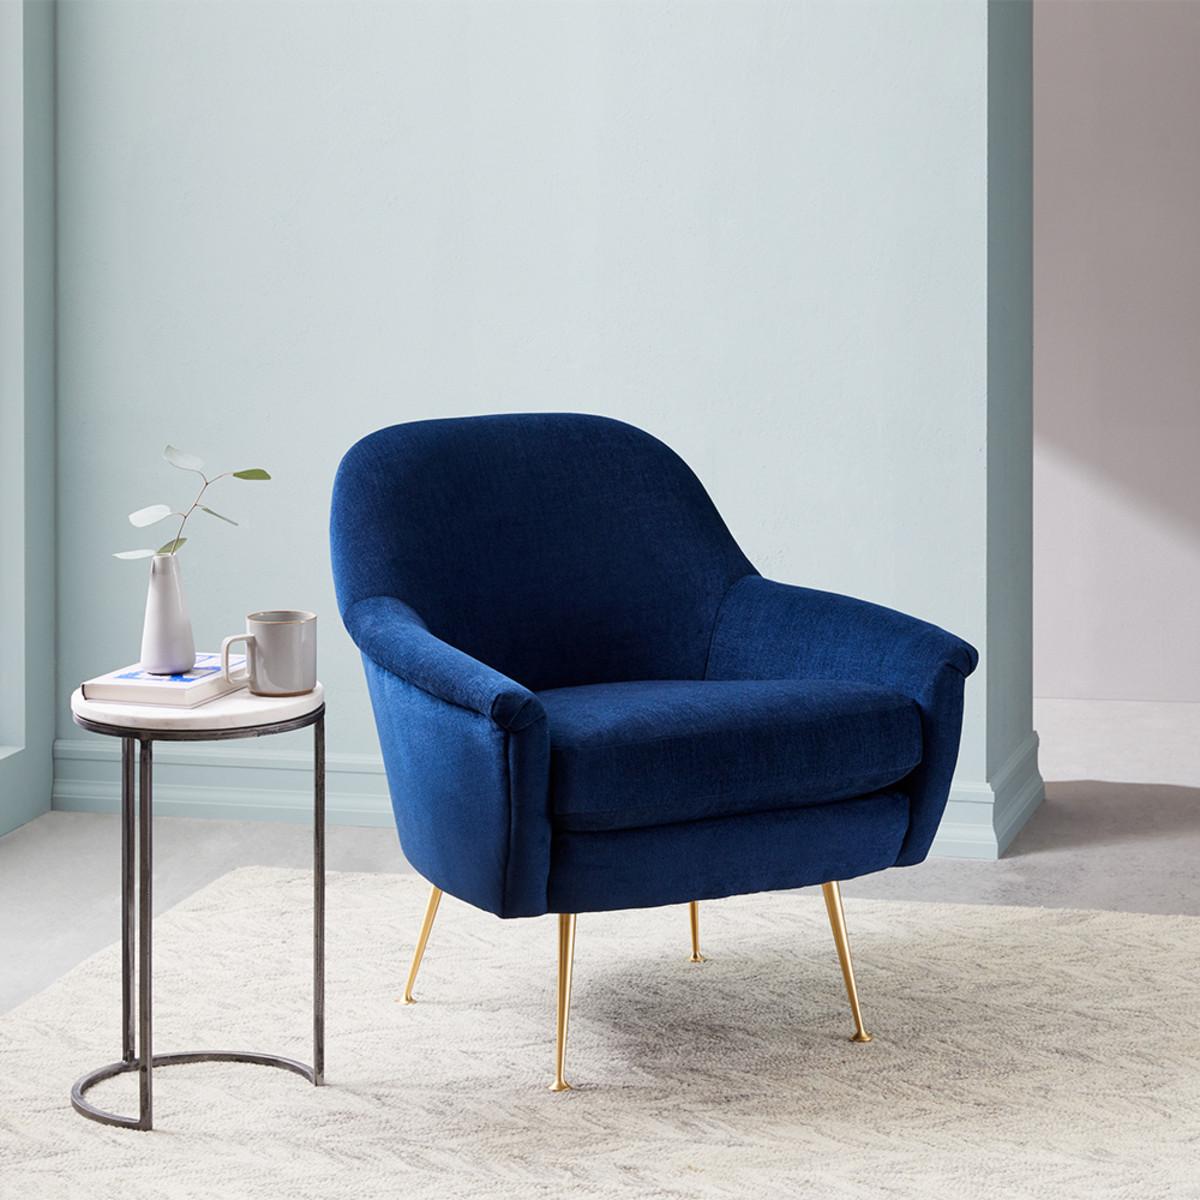 Phoebe Chair Ink Blue West Elm Australia Comfy Office Chair